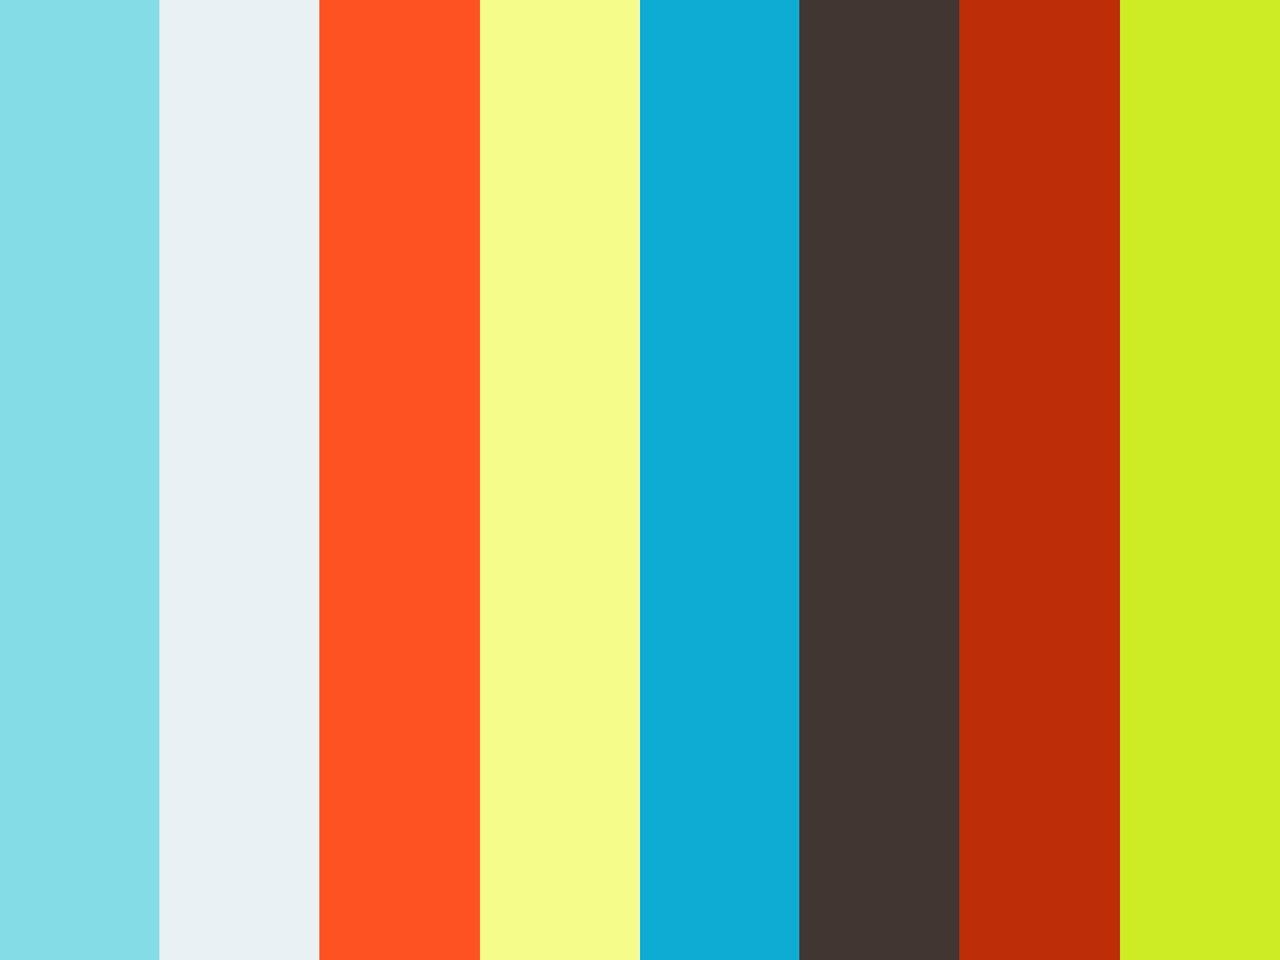 Denis LaClare 4 - Mission